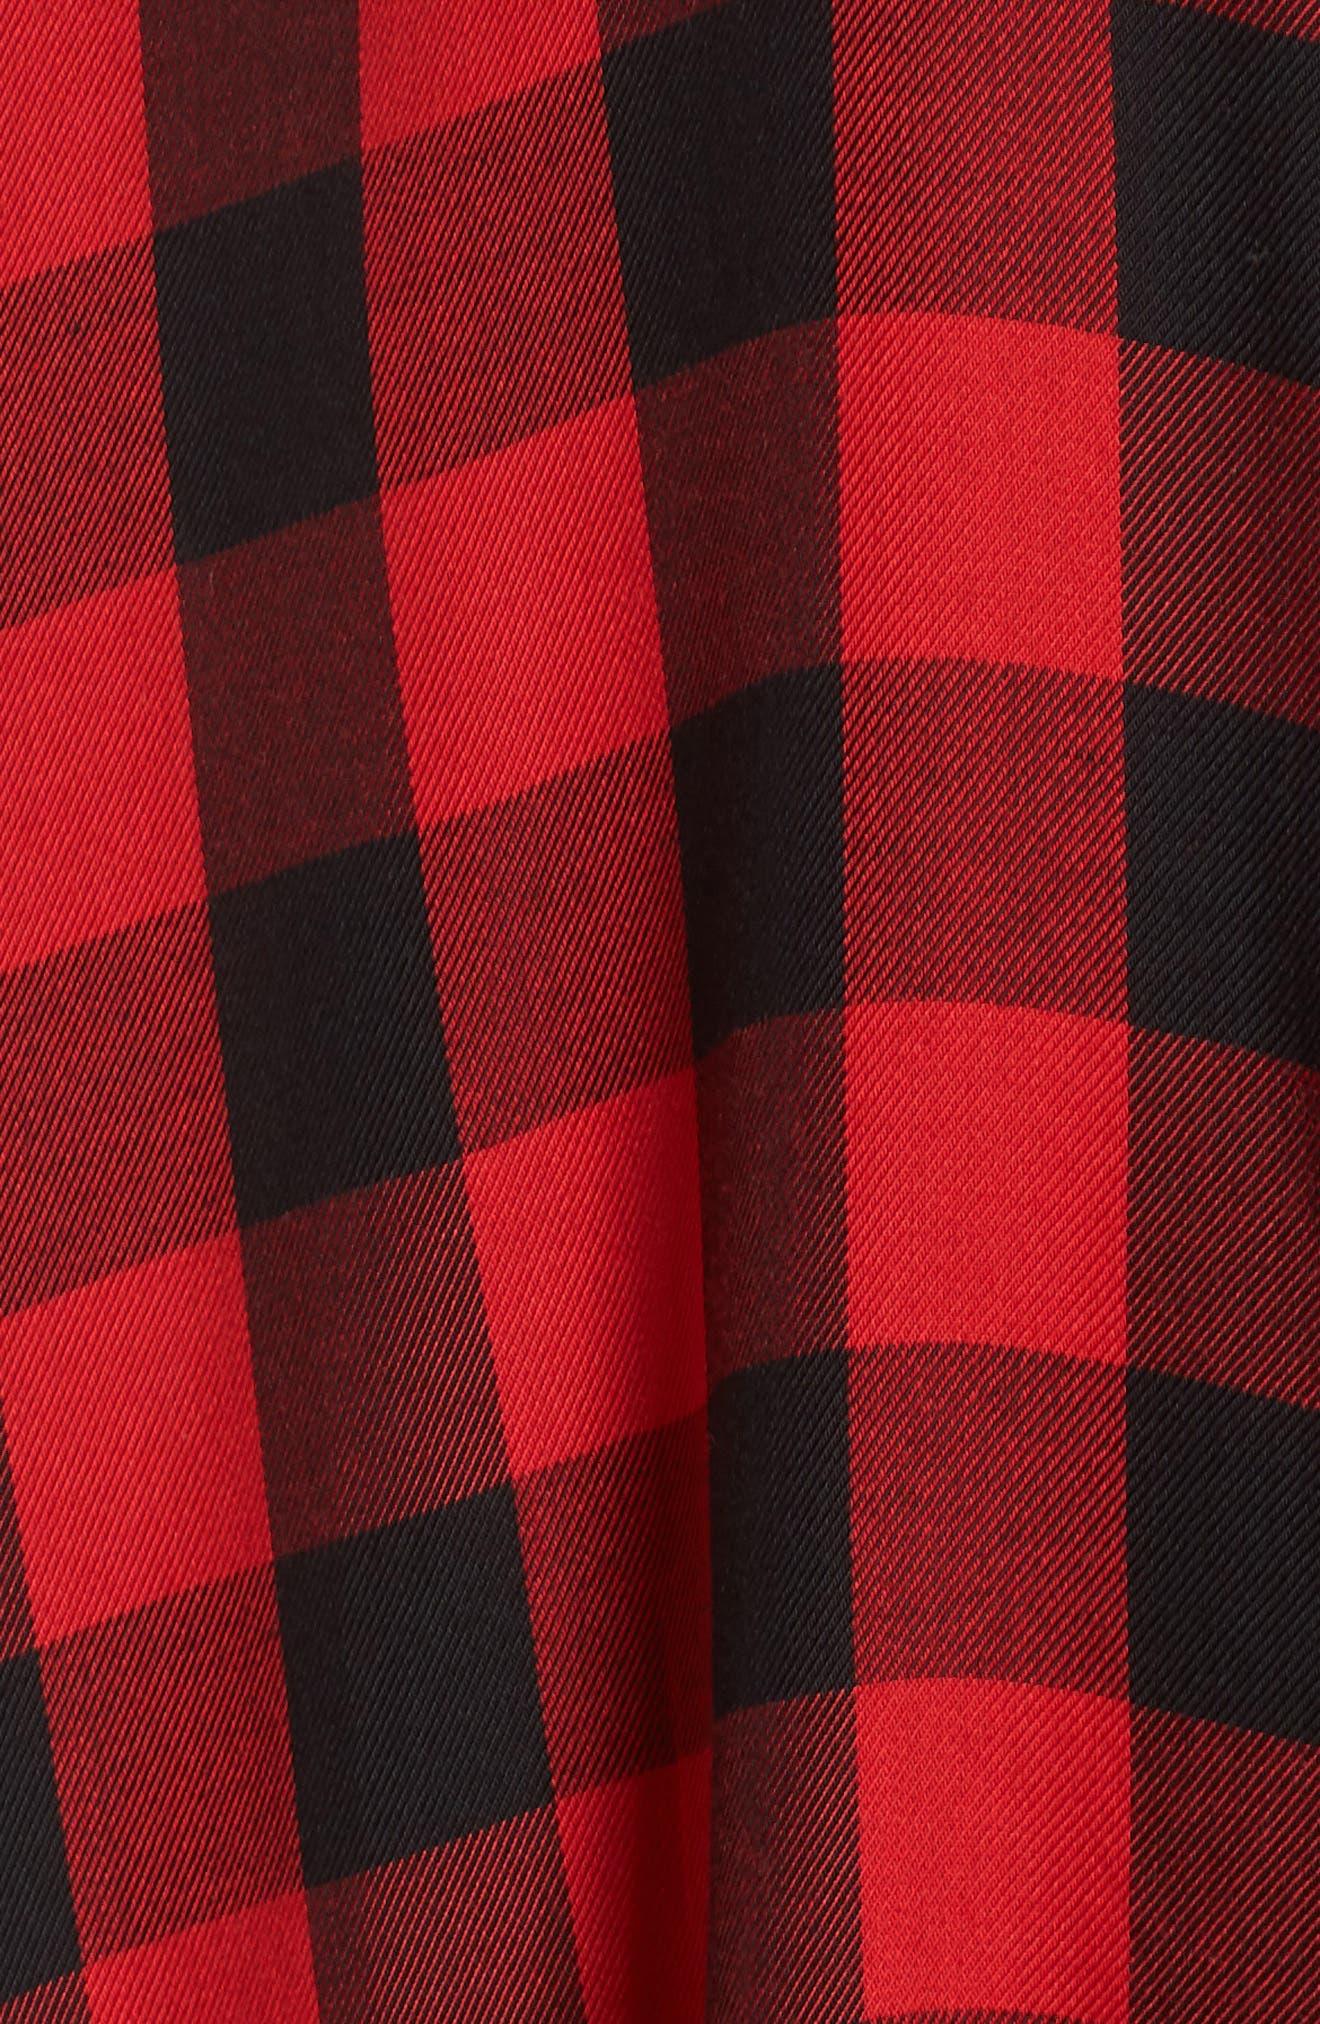 Buffalo Plaid Shirtdress,                             Alternate thumbnail 6, color,                             BRIGHT RED